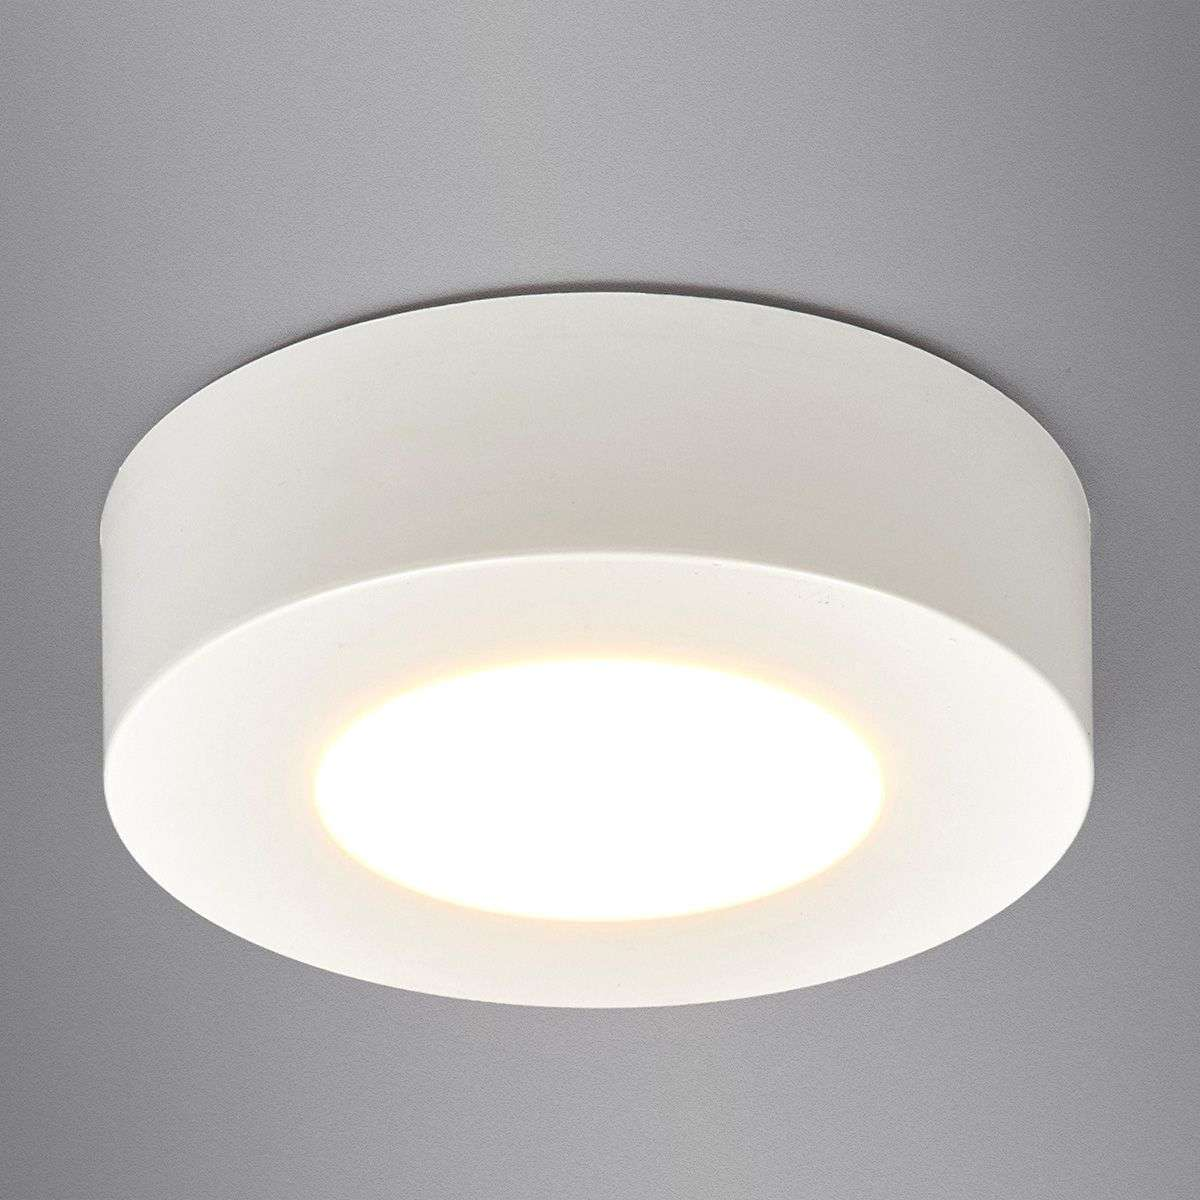 Surface mounted ceiling light esra with leds lights surface mounted ceiling light esra with leds 9978019 313 aloadofball Choice Image